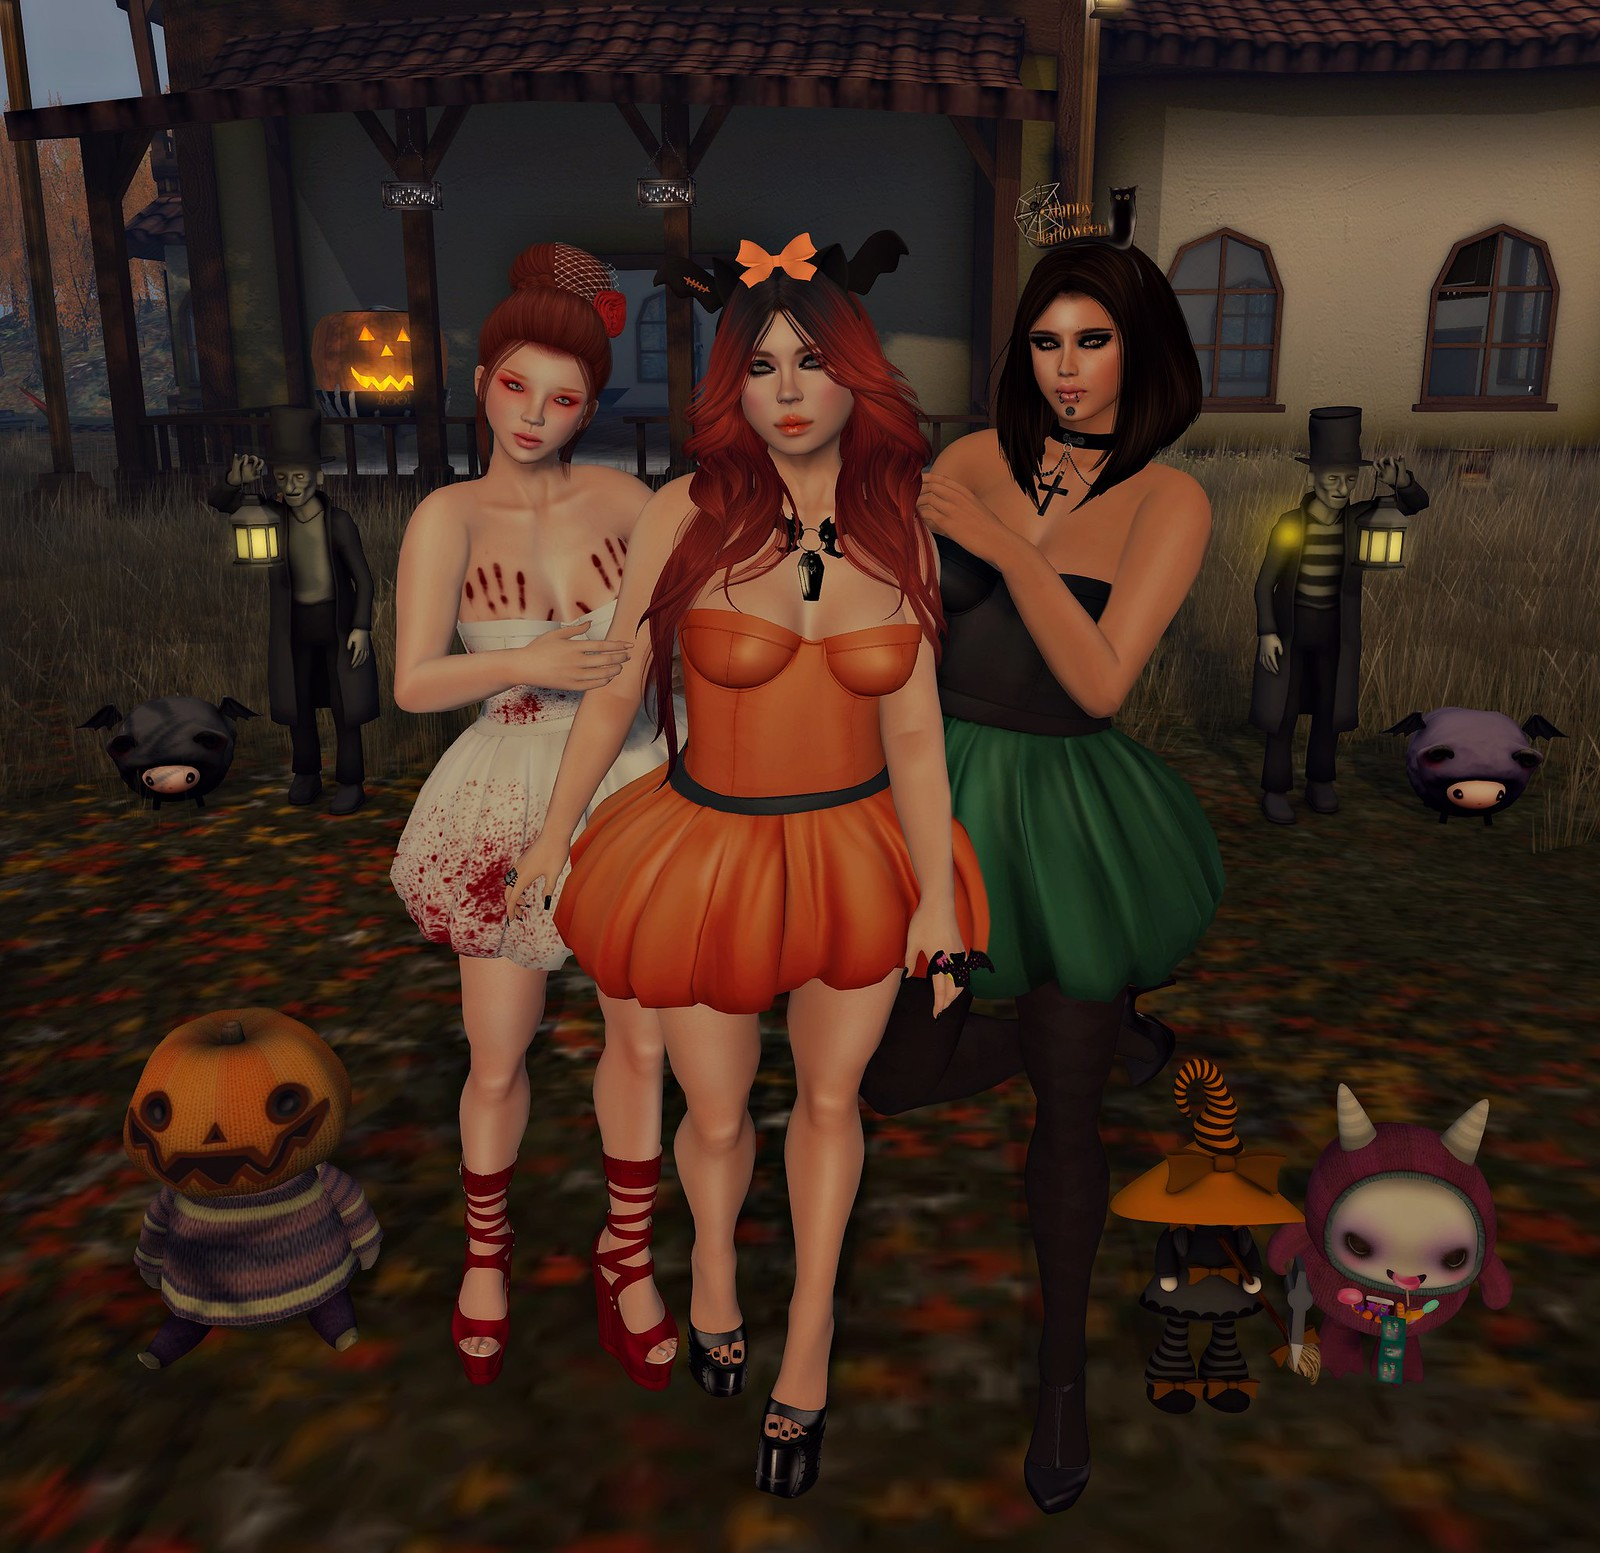 The Sinners - Happy Halloween